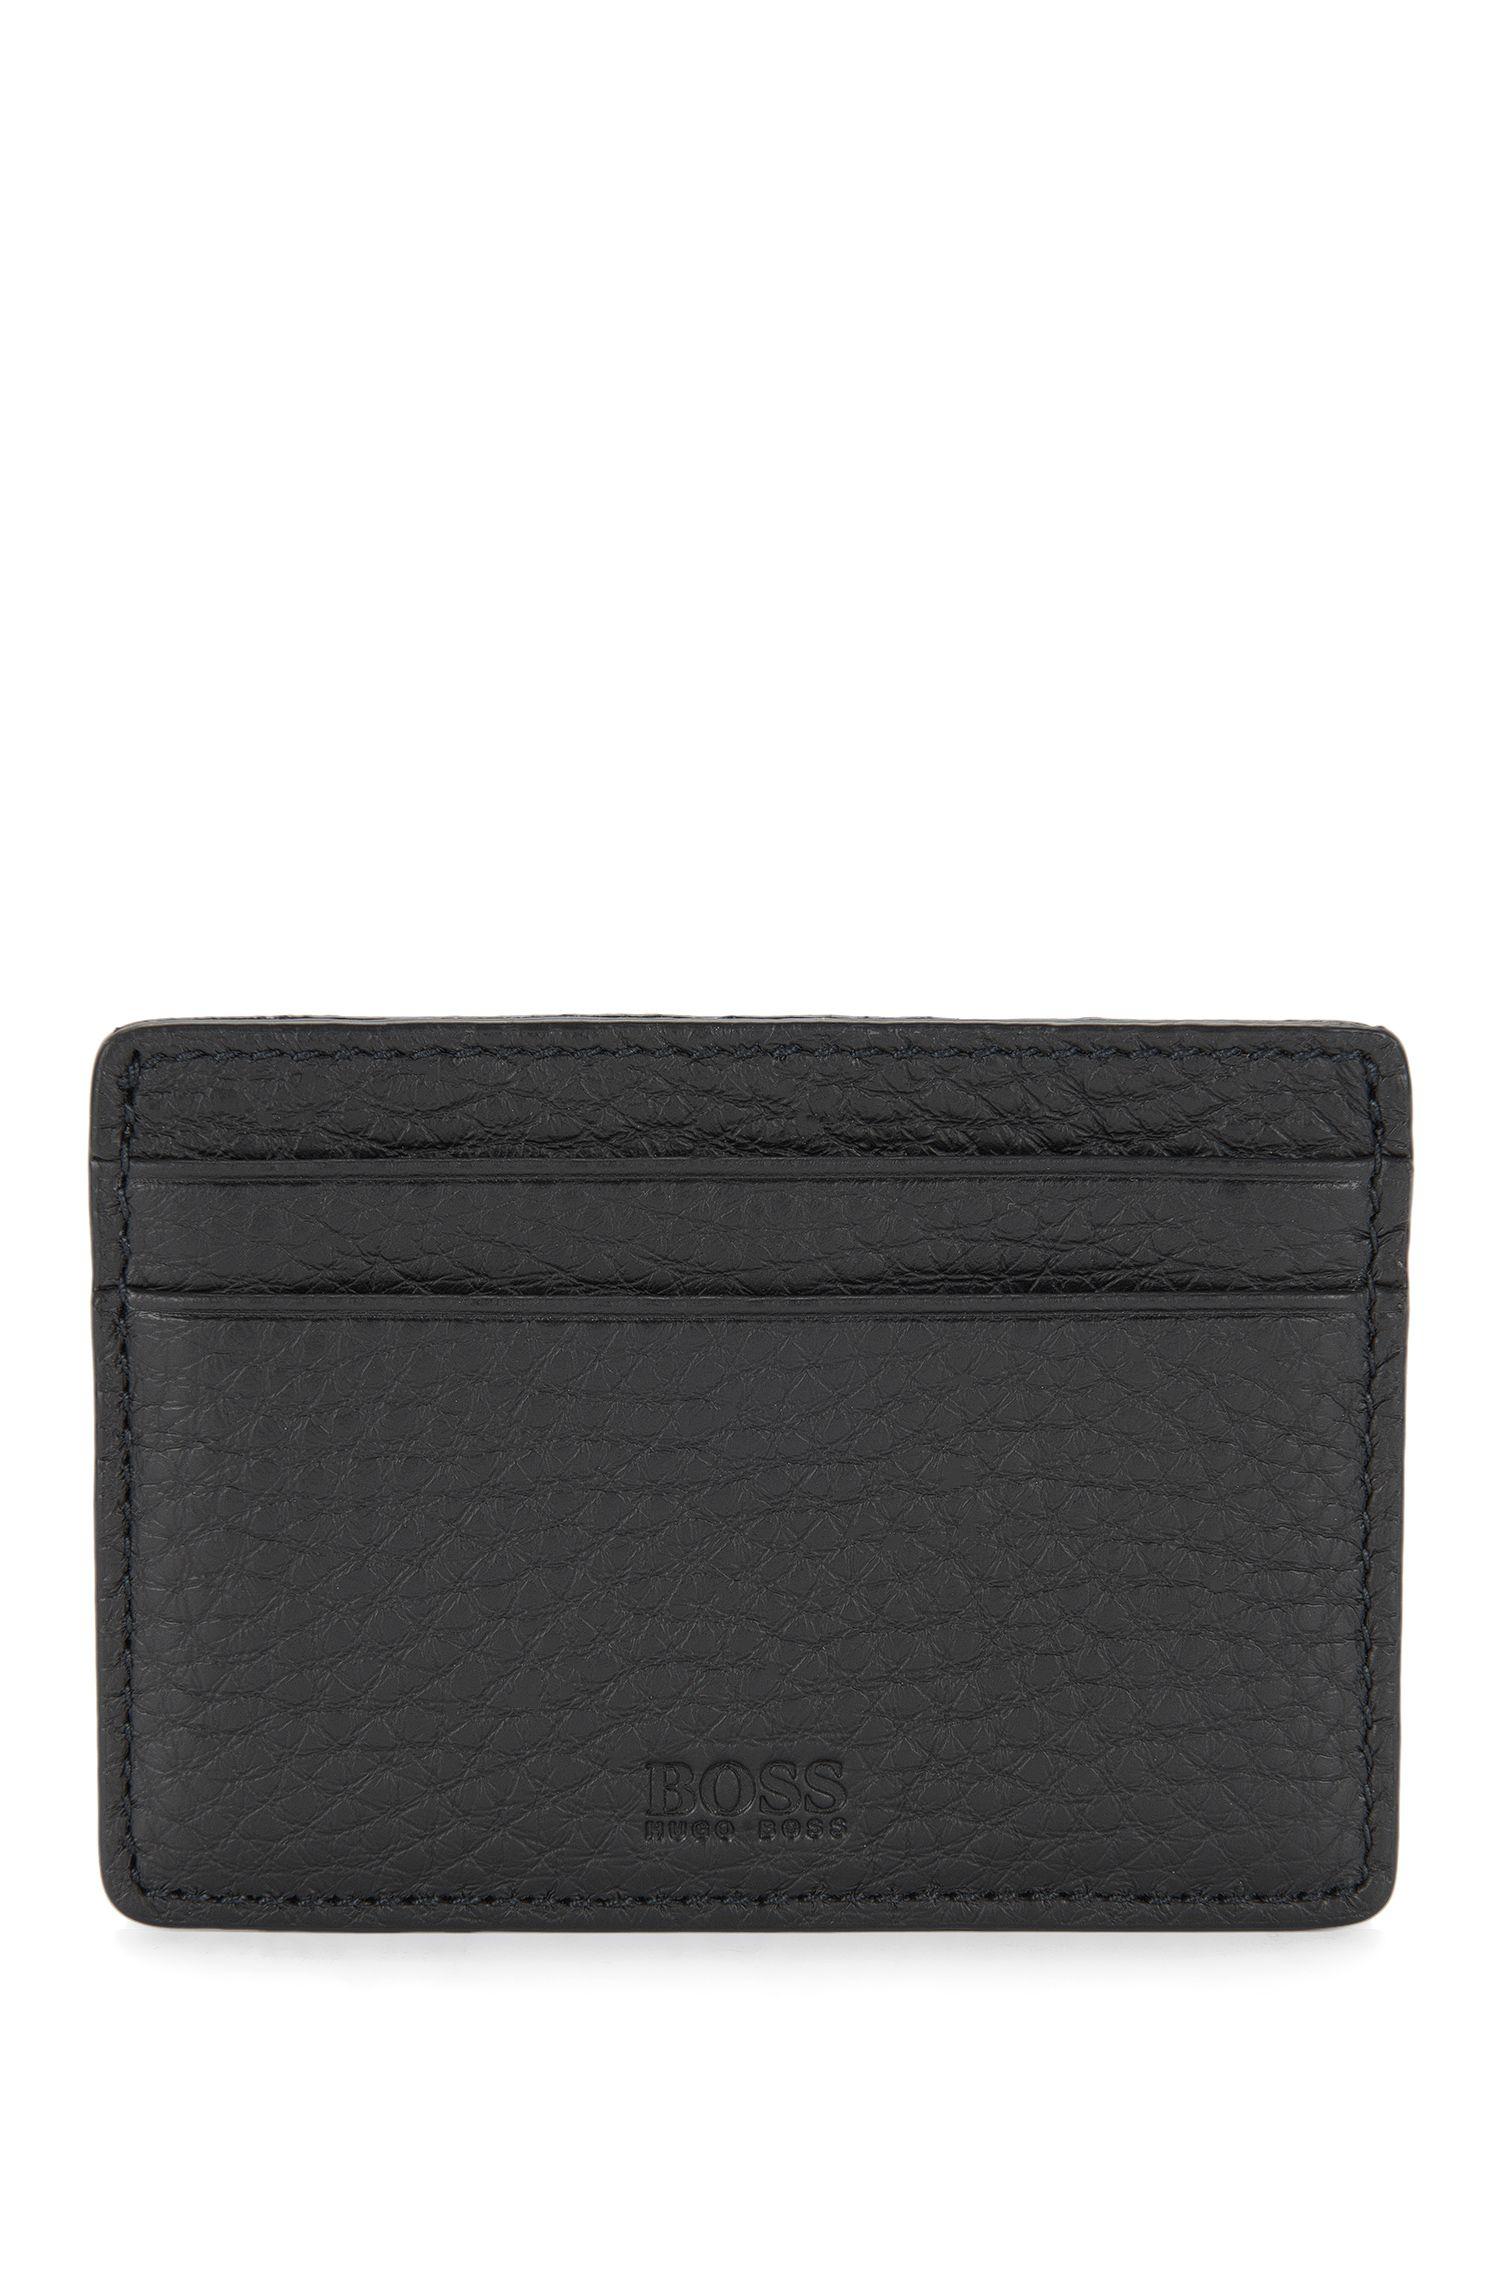 Leather Card Holder | Traveller S Card